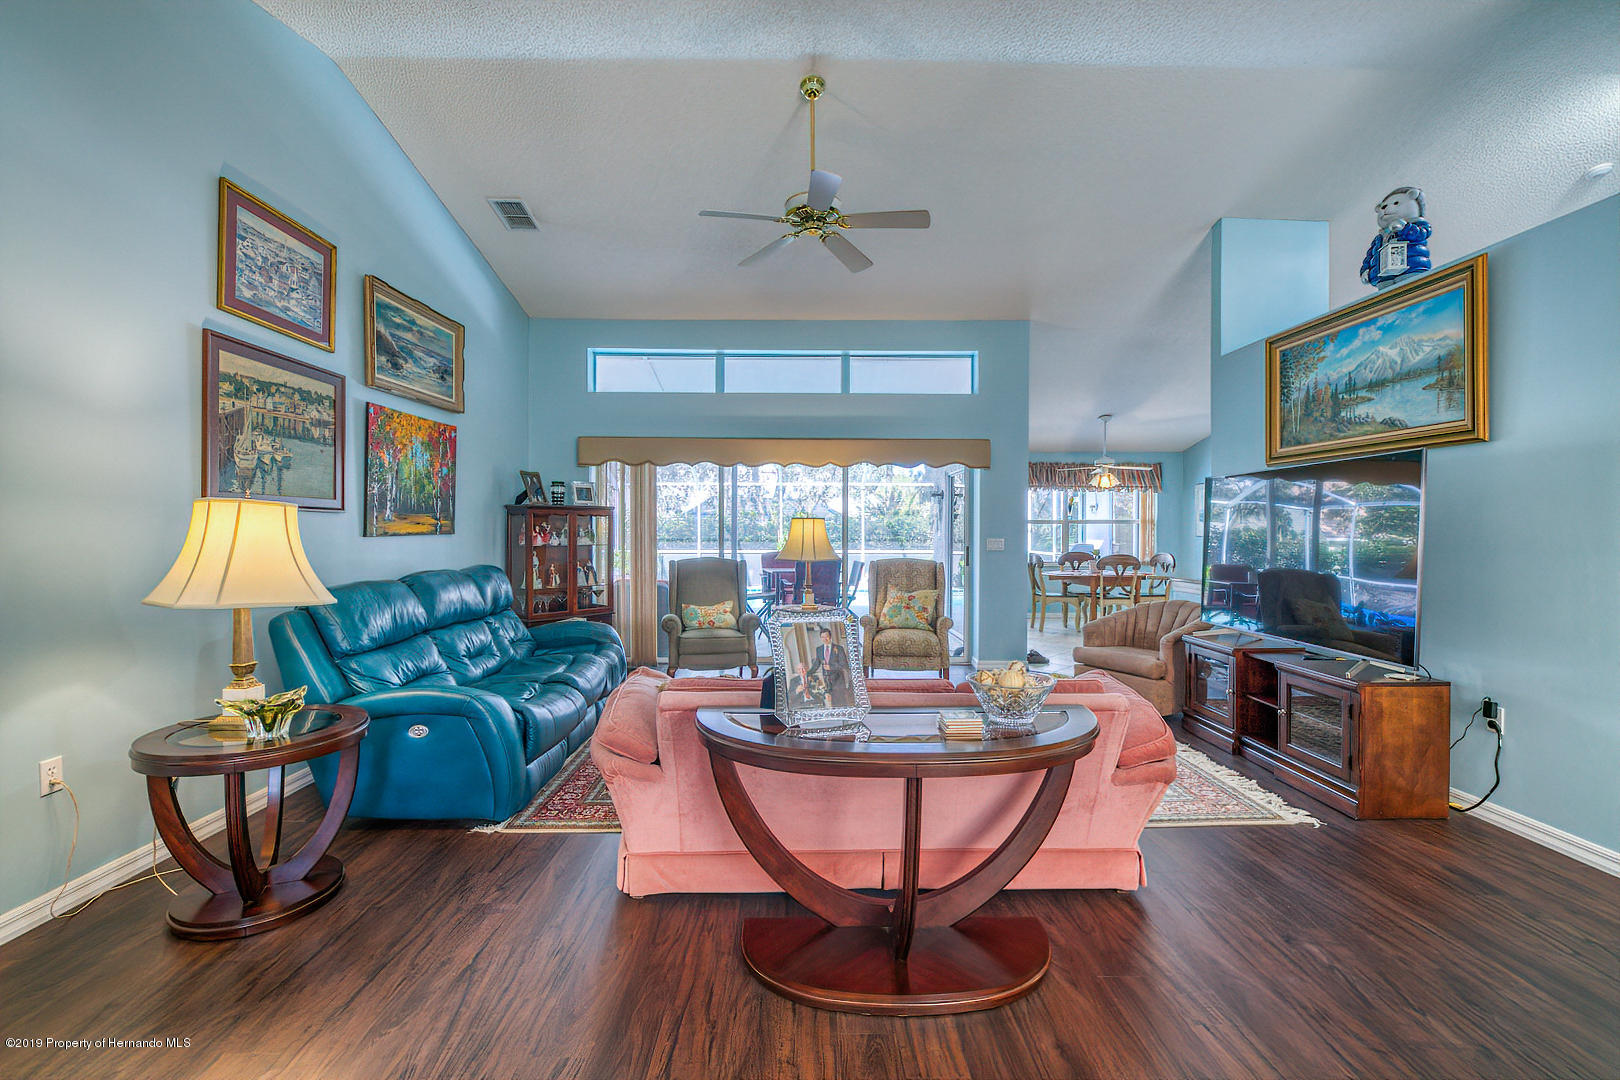 4535 Breakwater Boulevard, Spring Hill, Florida 34607, 3 Bedrooms Bedrooms, ,2 BathroomsBathrooms,Residential,For Sale,Breakwater,2203787